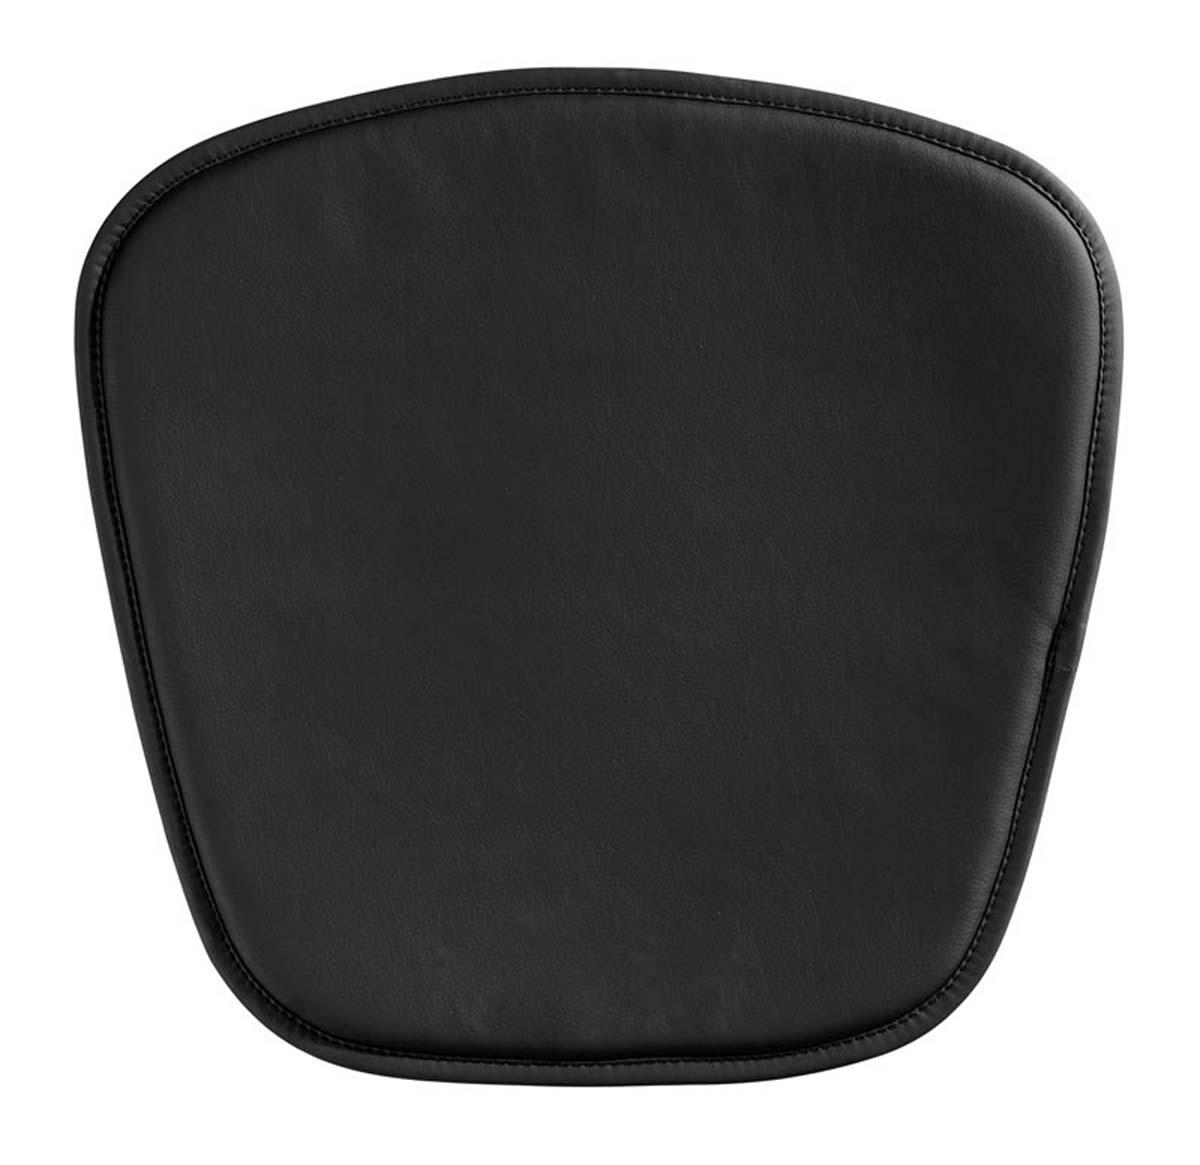 Zuo Modern Wire/Mesh Cushion - Black